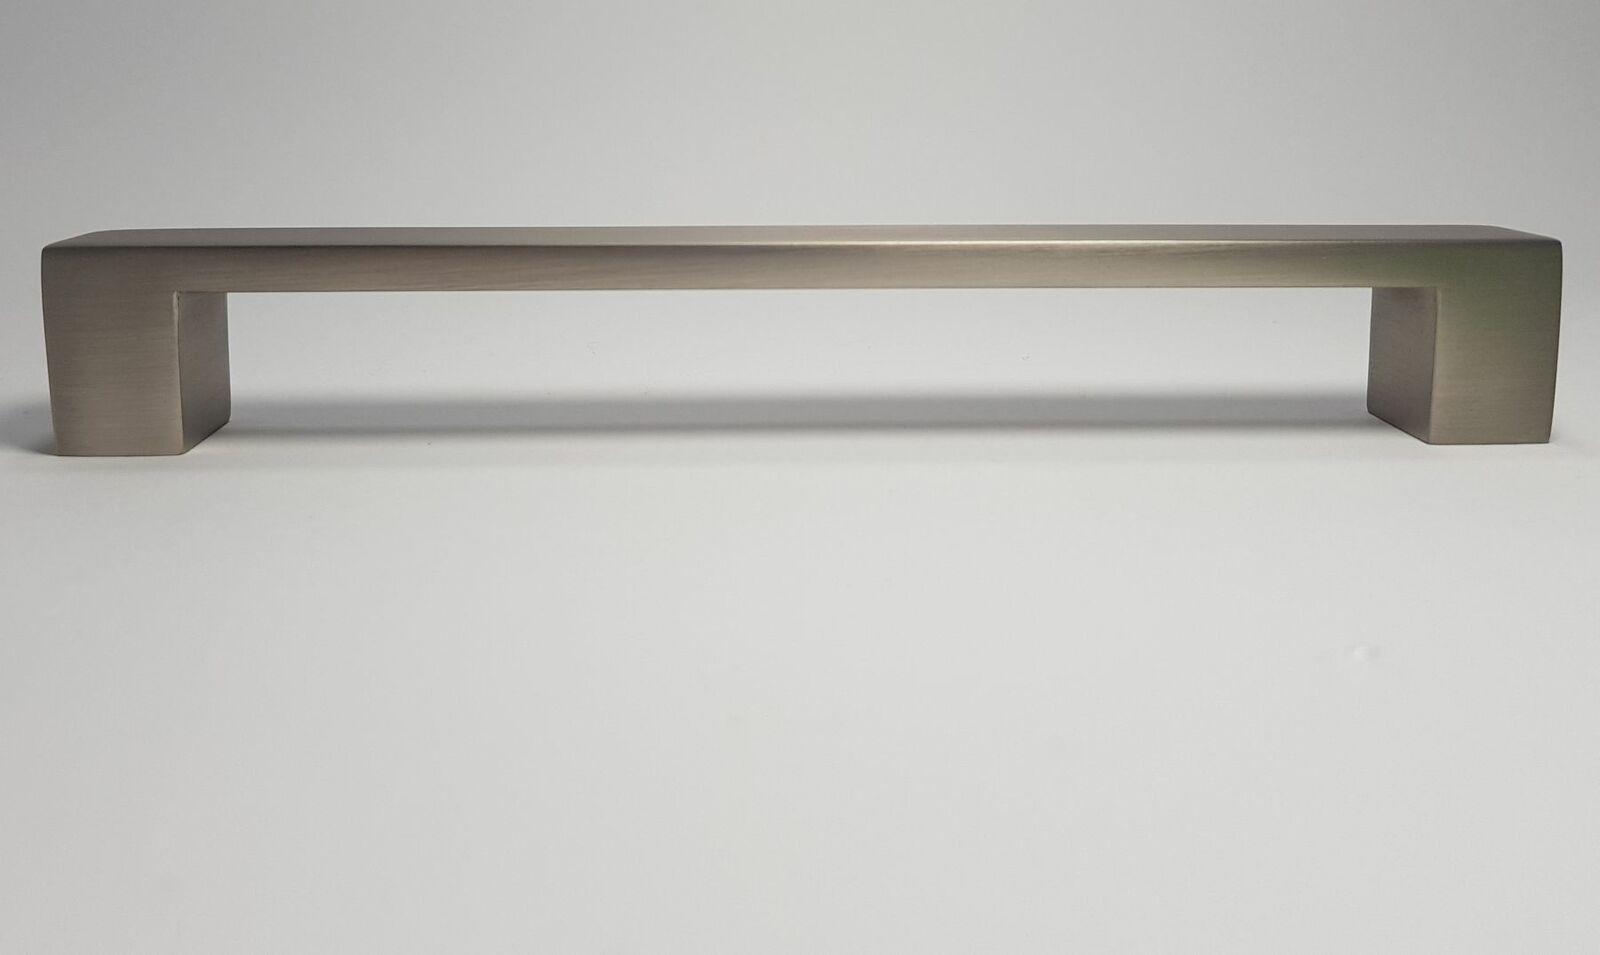 ... Möbelgriffe BA 160 Mm Edelstahl Optik Schrankgriff Griffe Küche  Türgriff *667 13 3 ...